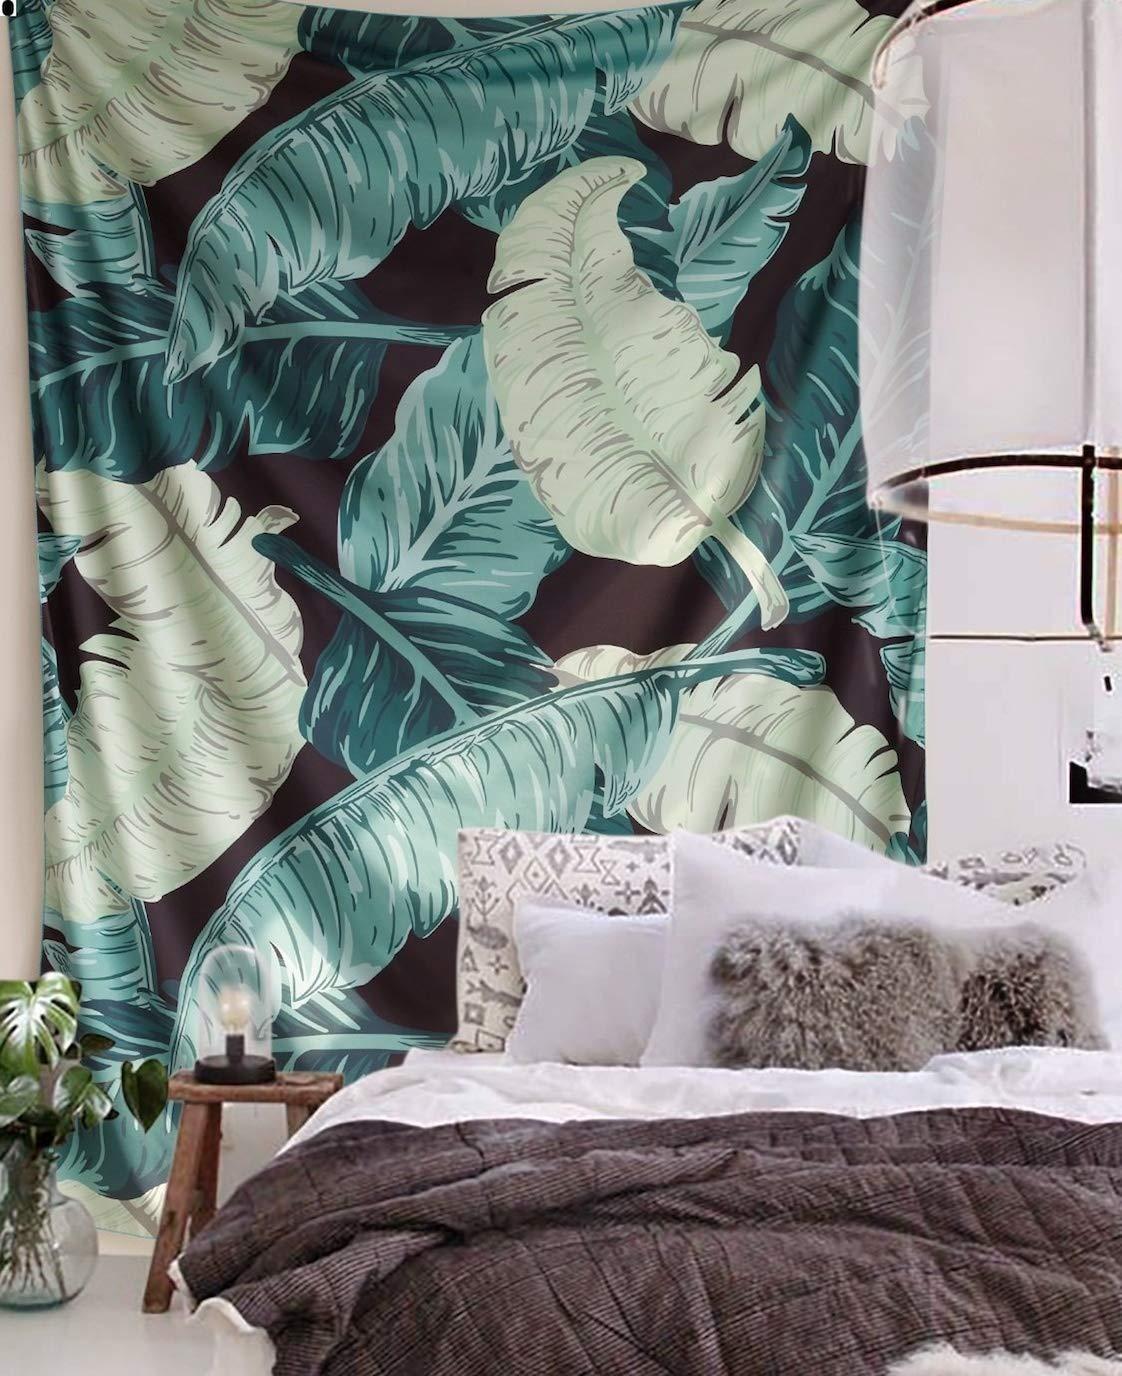 Flber Banana Leaf Wall Tapestry Home Decor,60''x 80'',Twin Size (Banana)